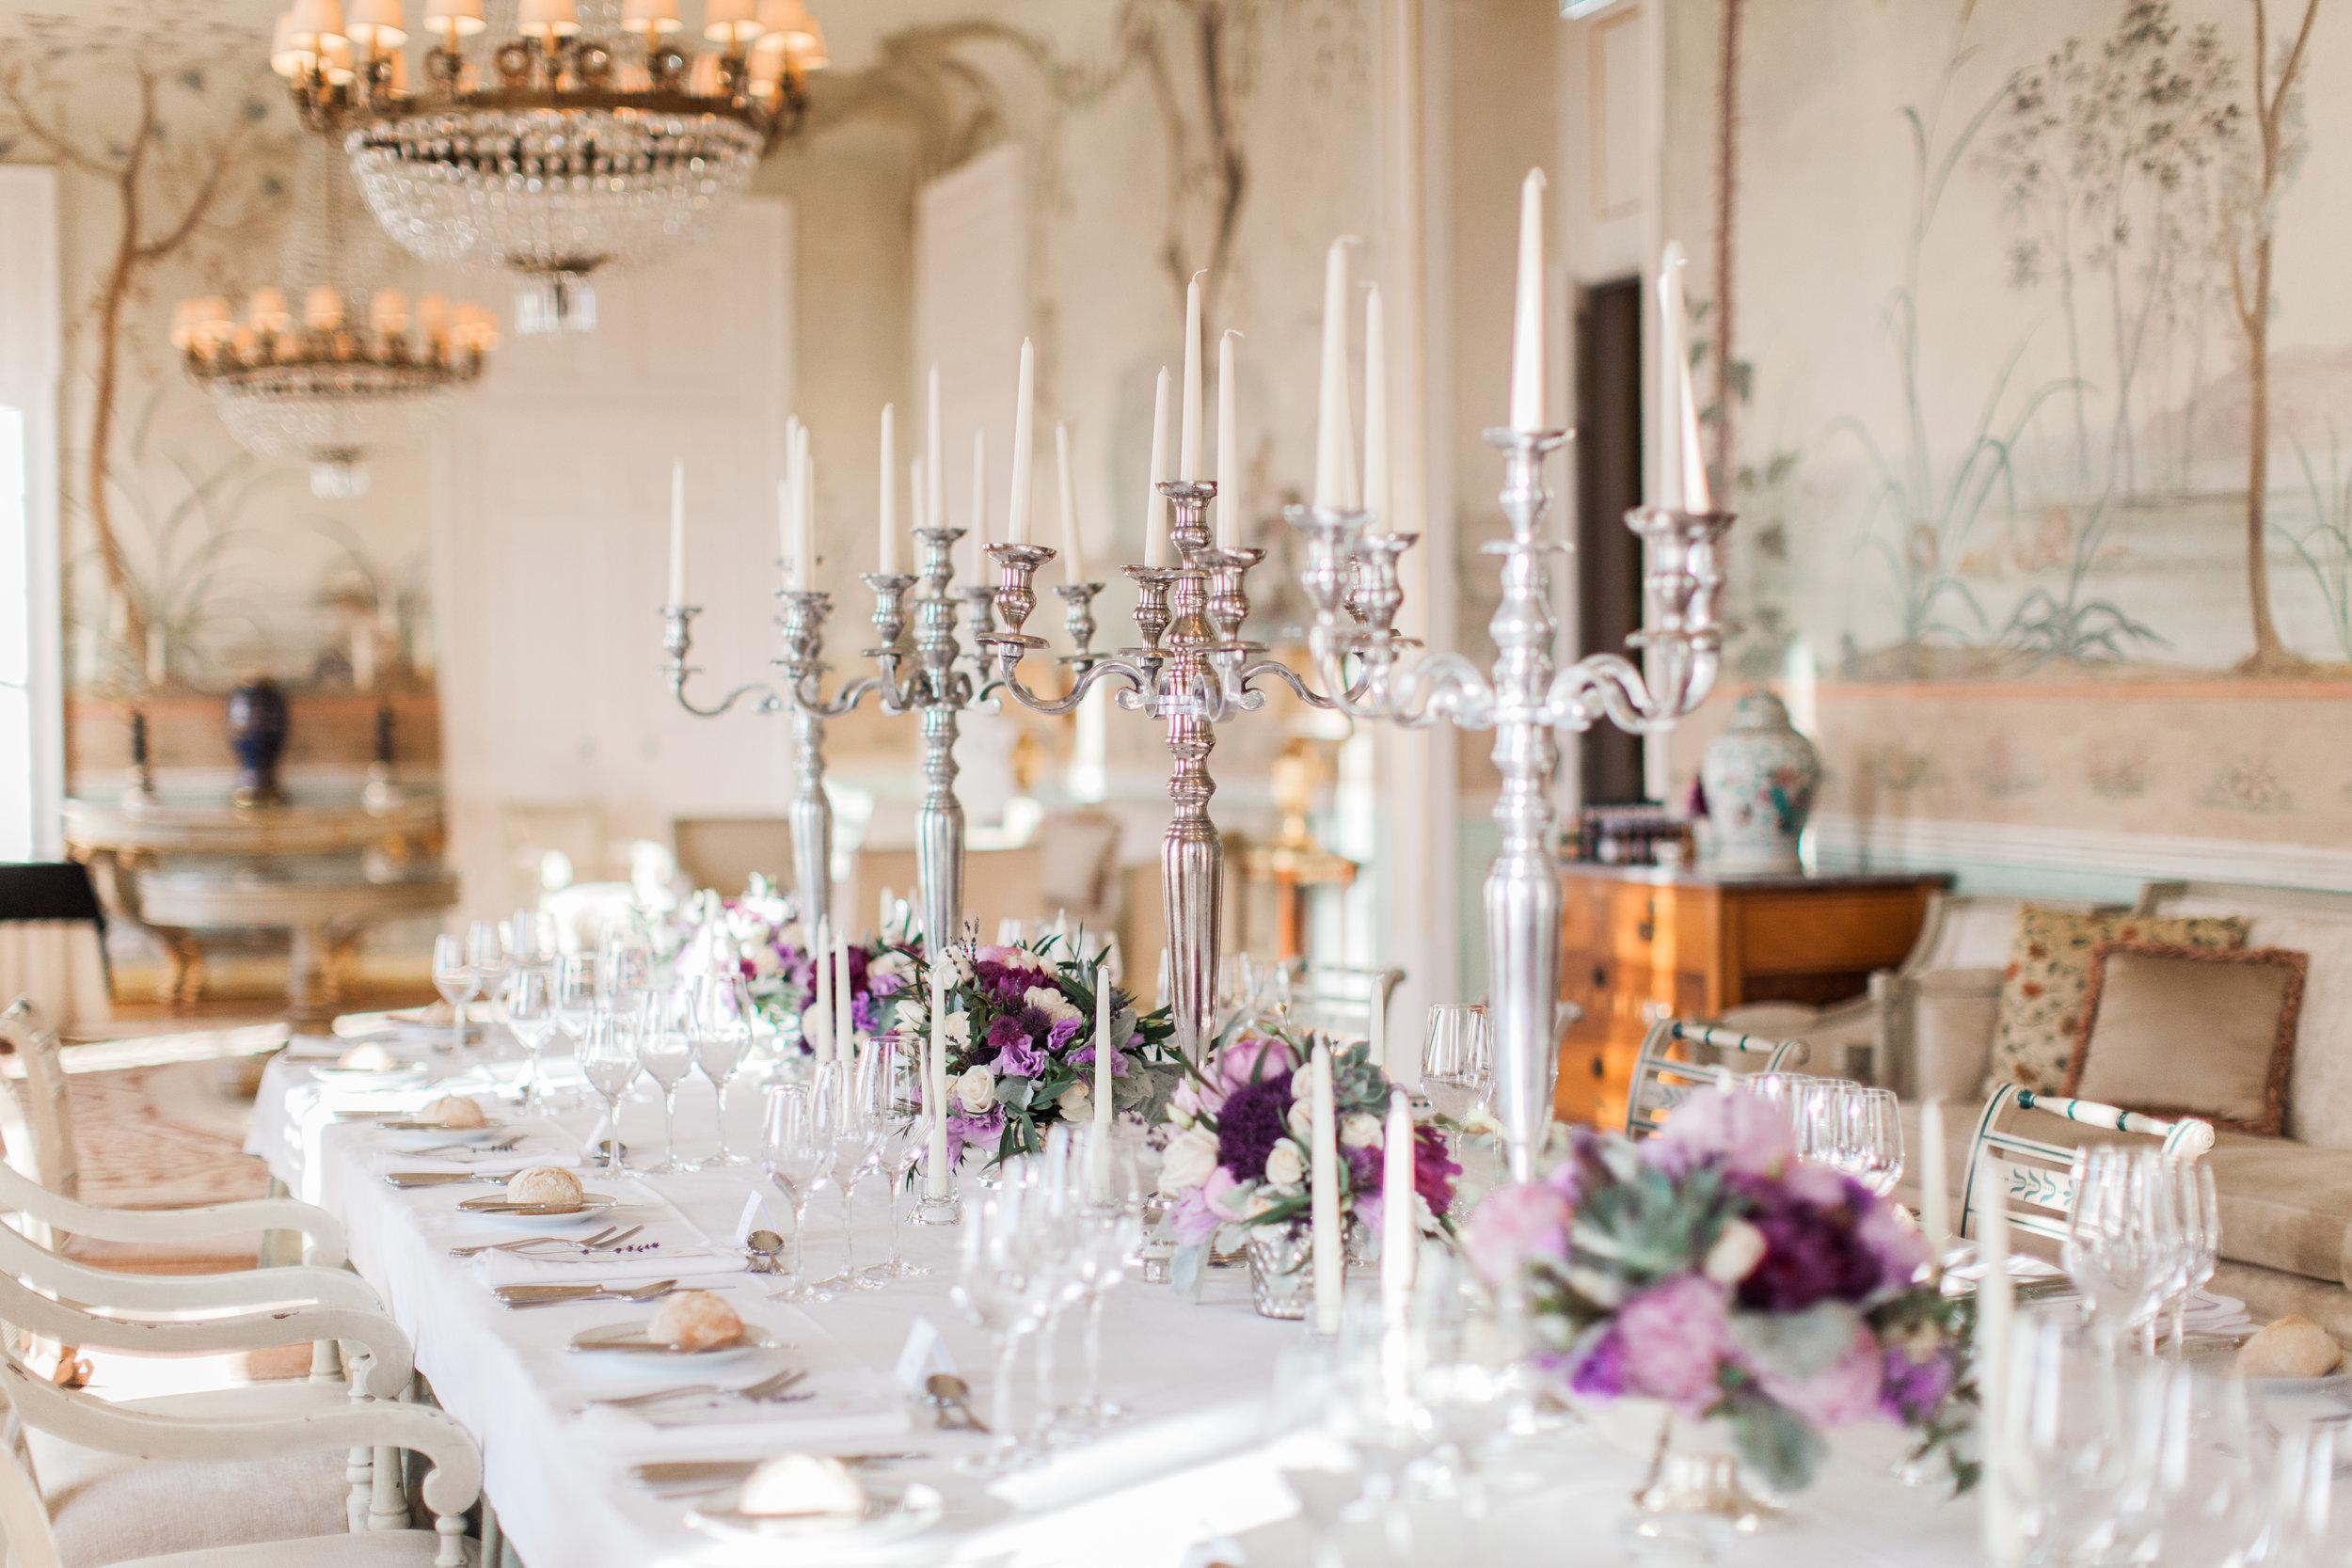 mariarao-wedding-palacio-seteais-226.jpg